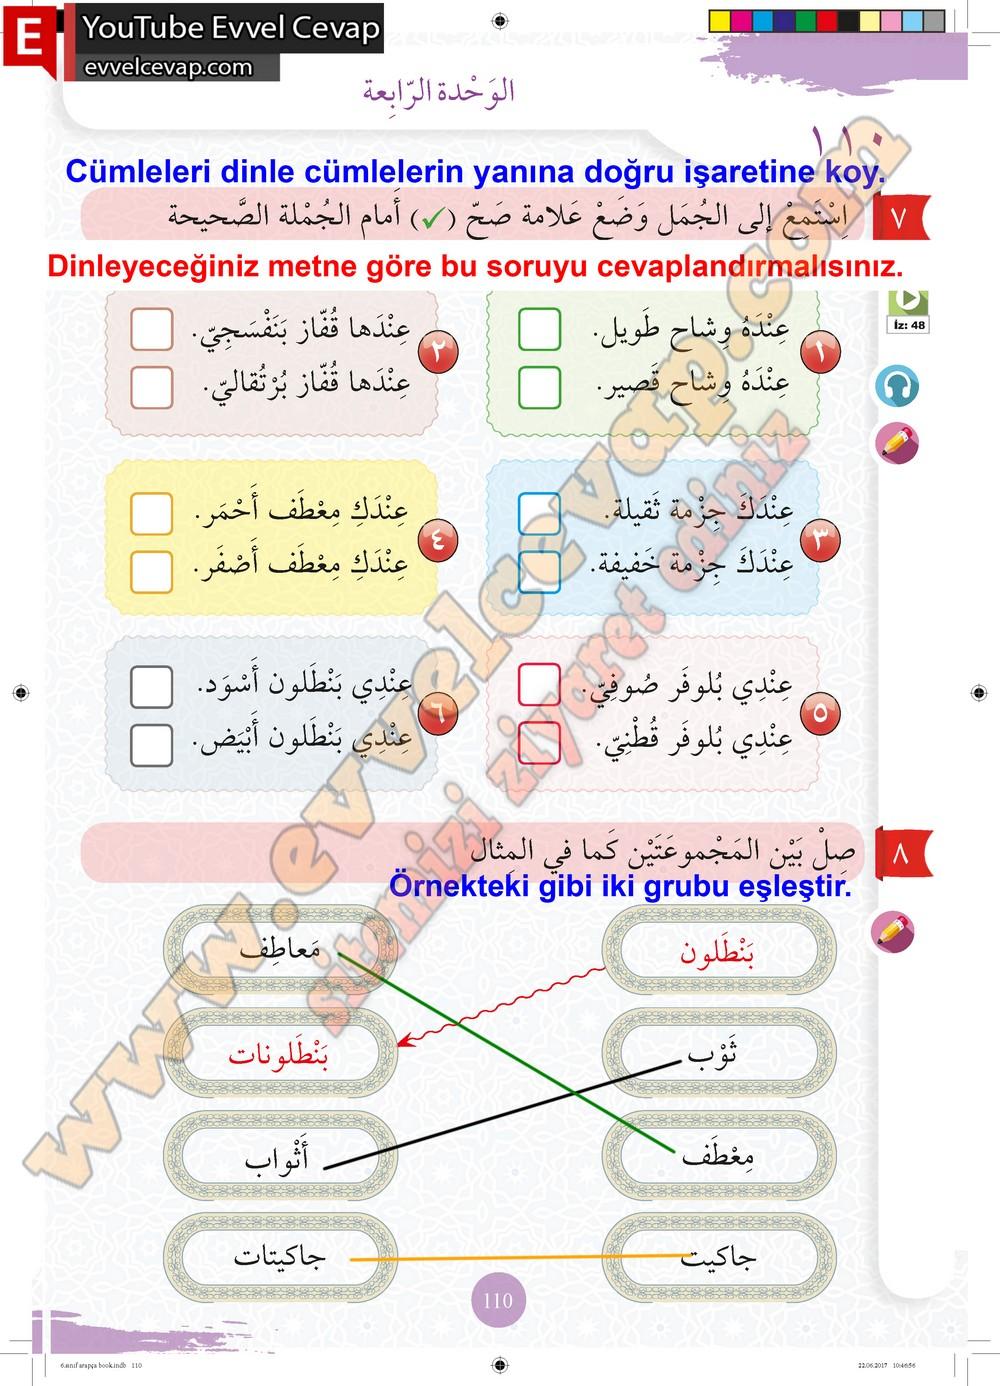 6 Sinif Arapca Ders Ve Calisma Kitabi Sayfa 110 Meb